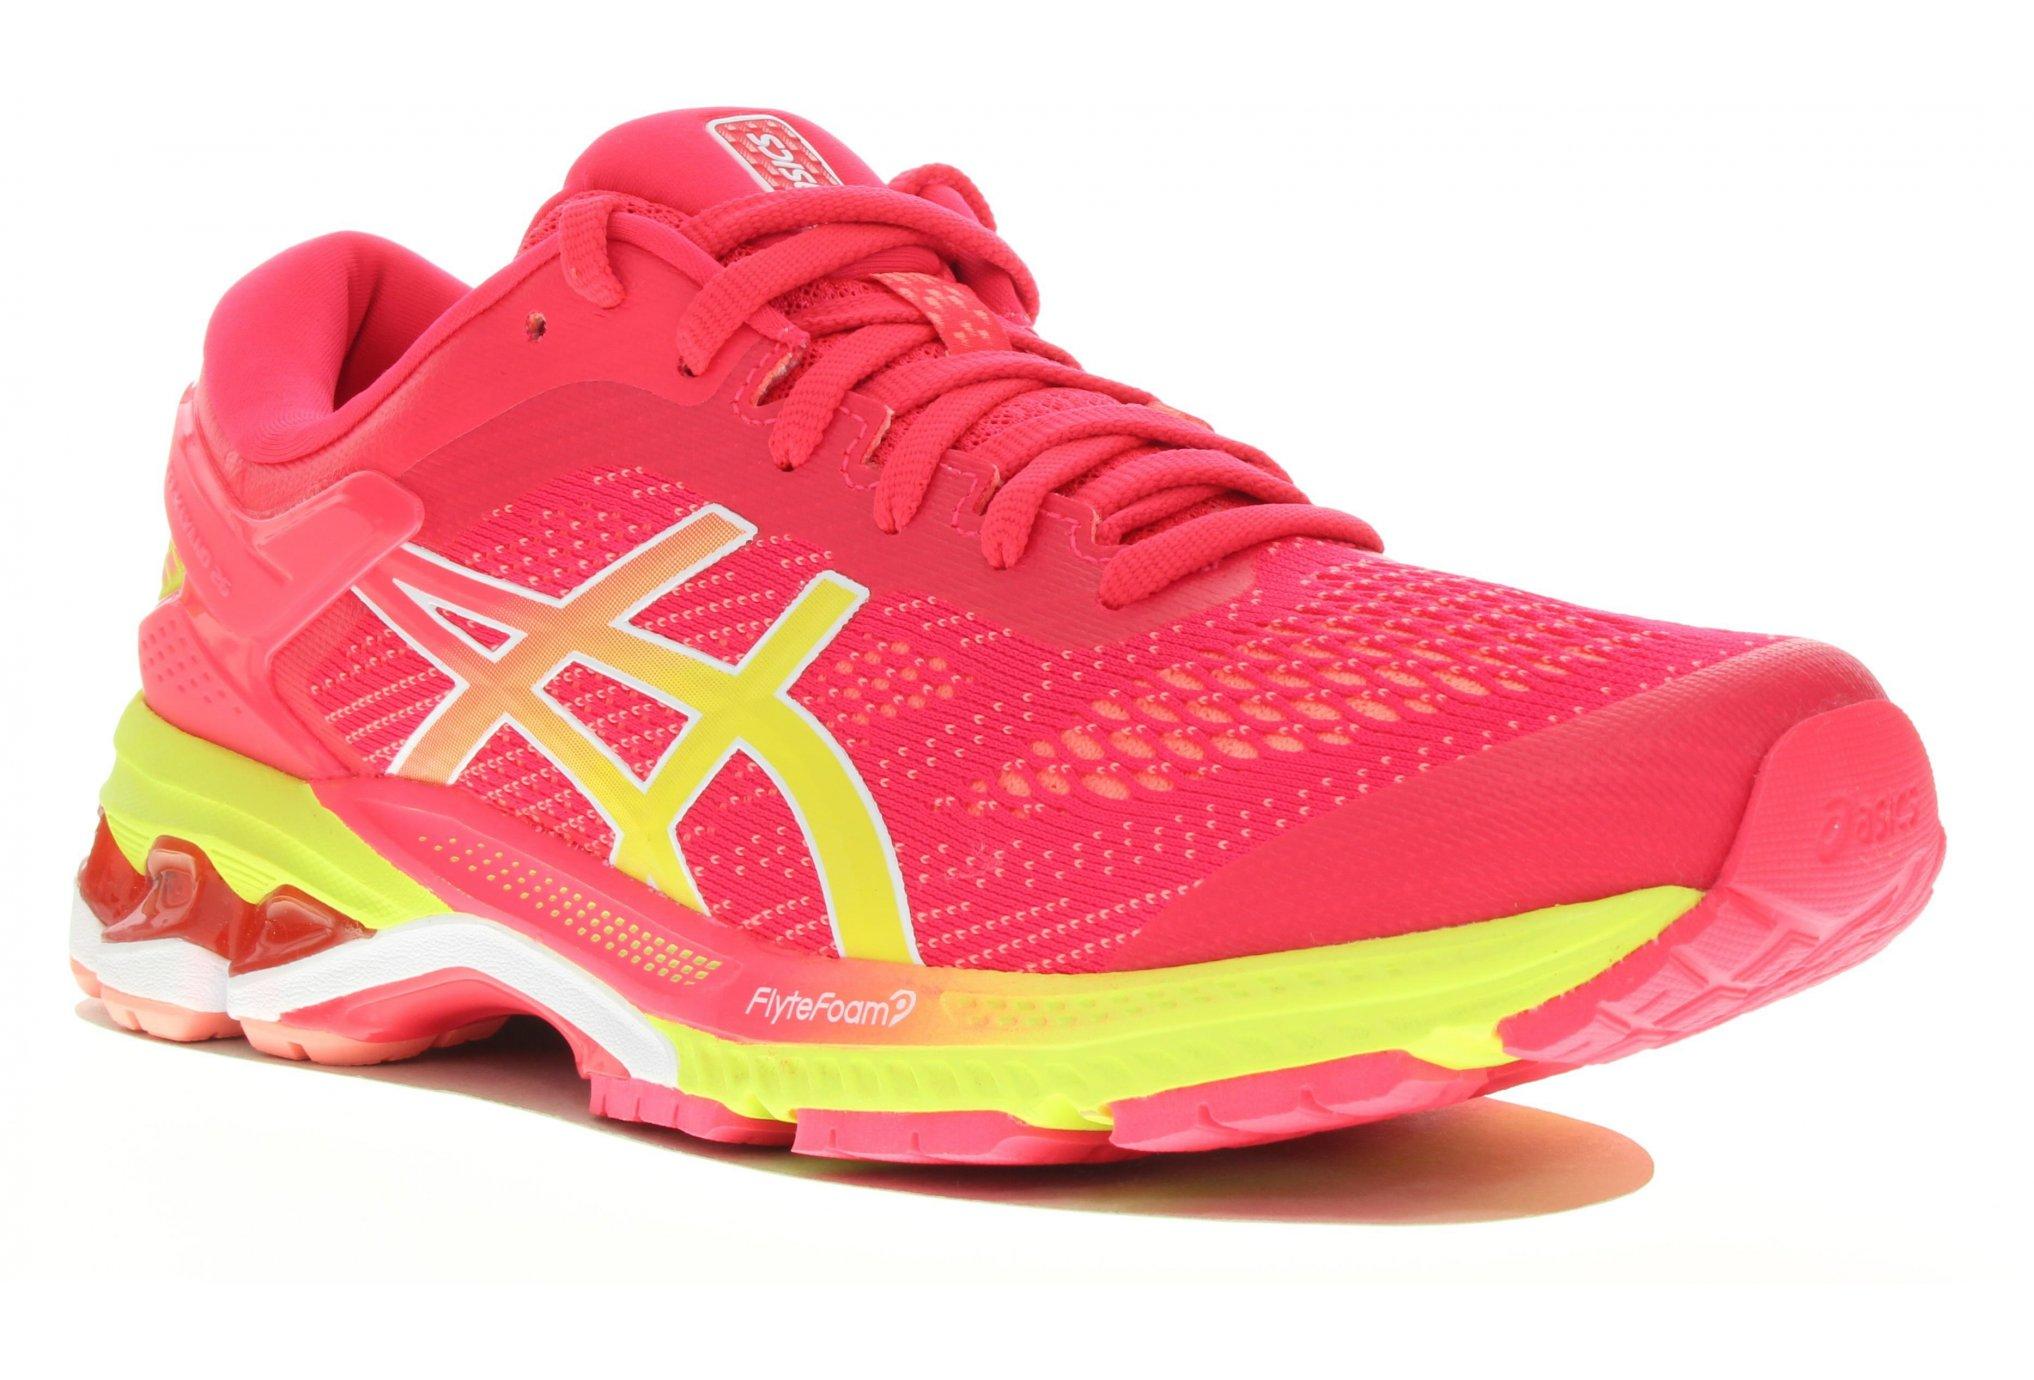 Asics Gel Kayano 26 Shine Chaussures running femme